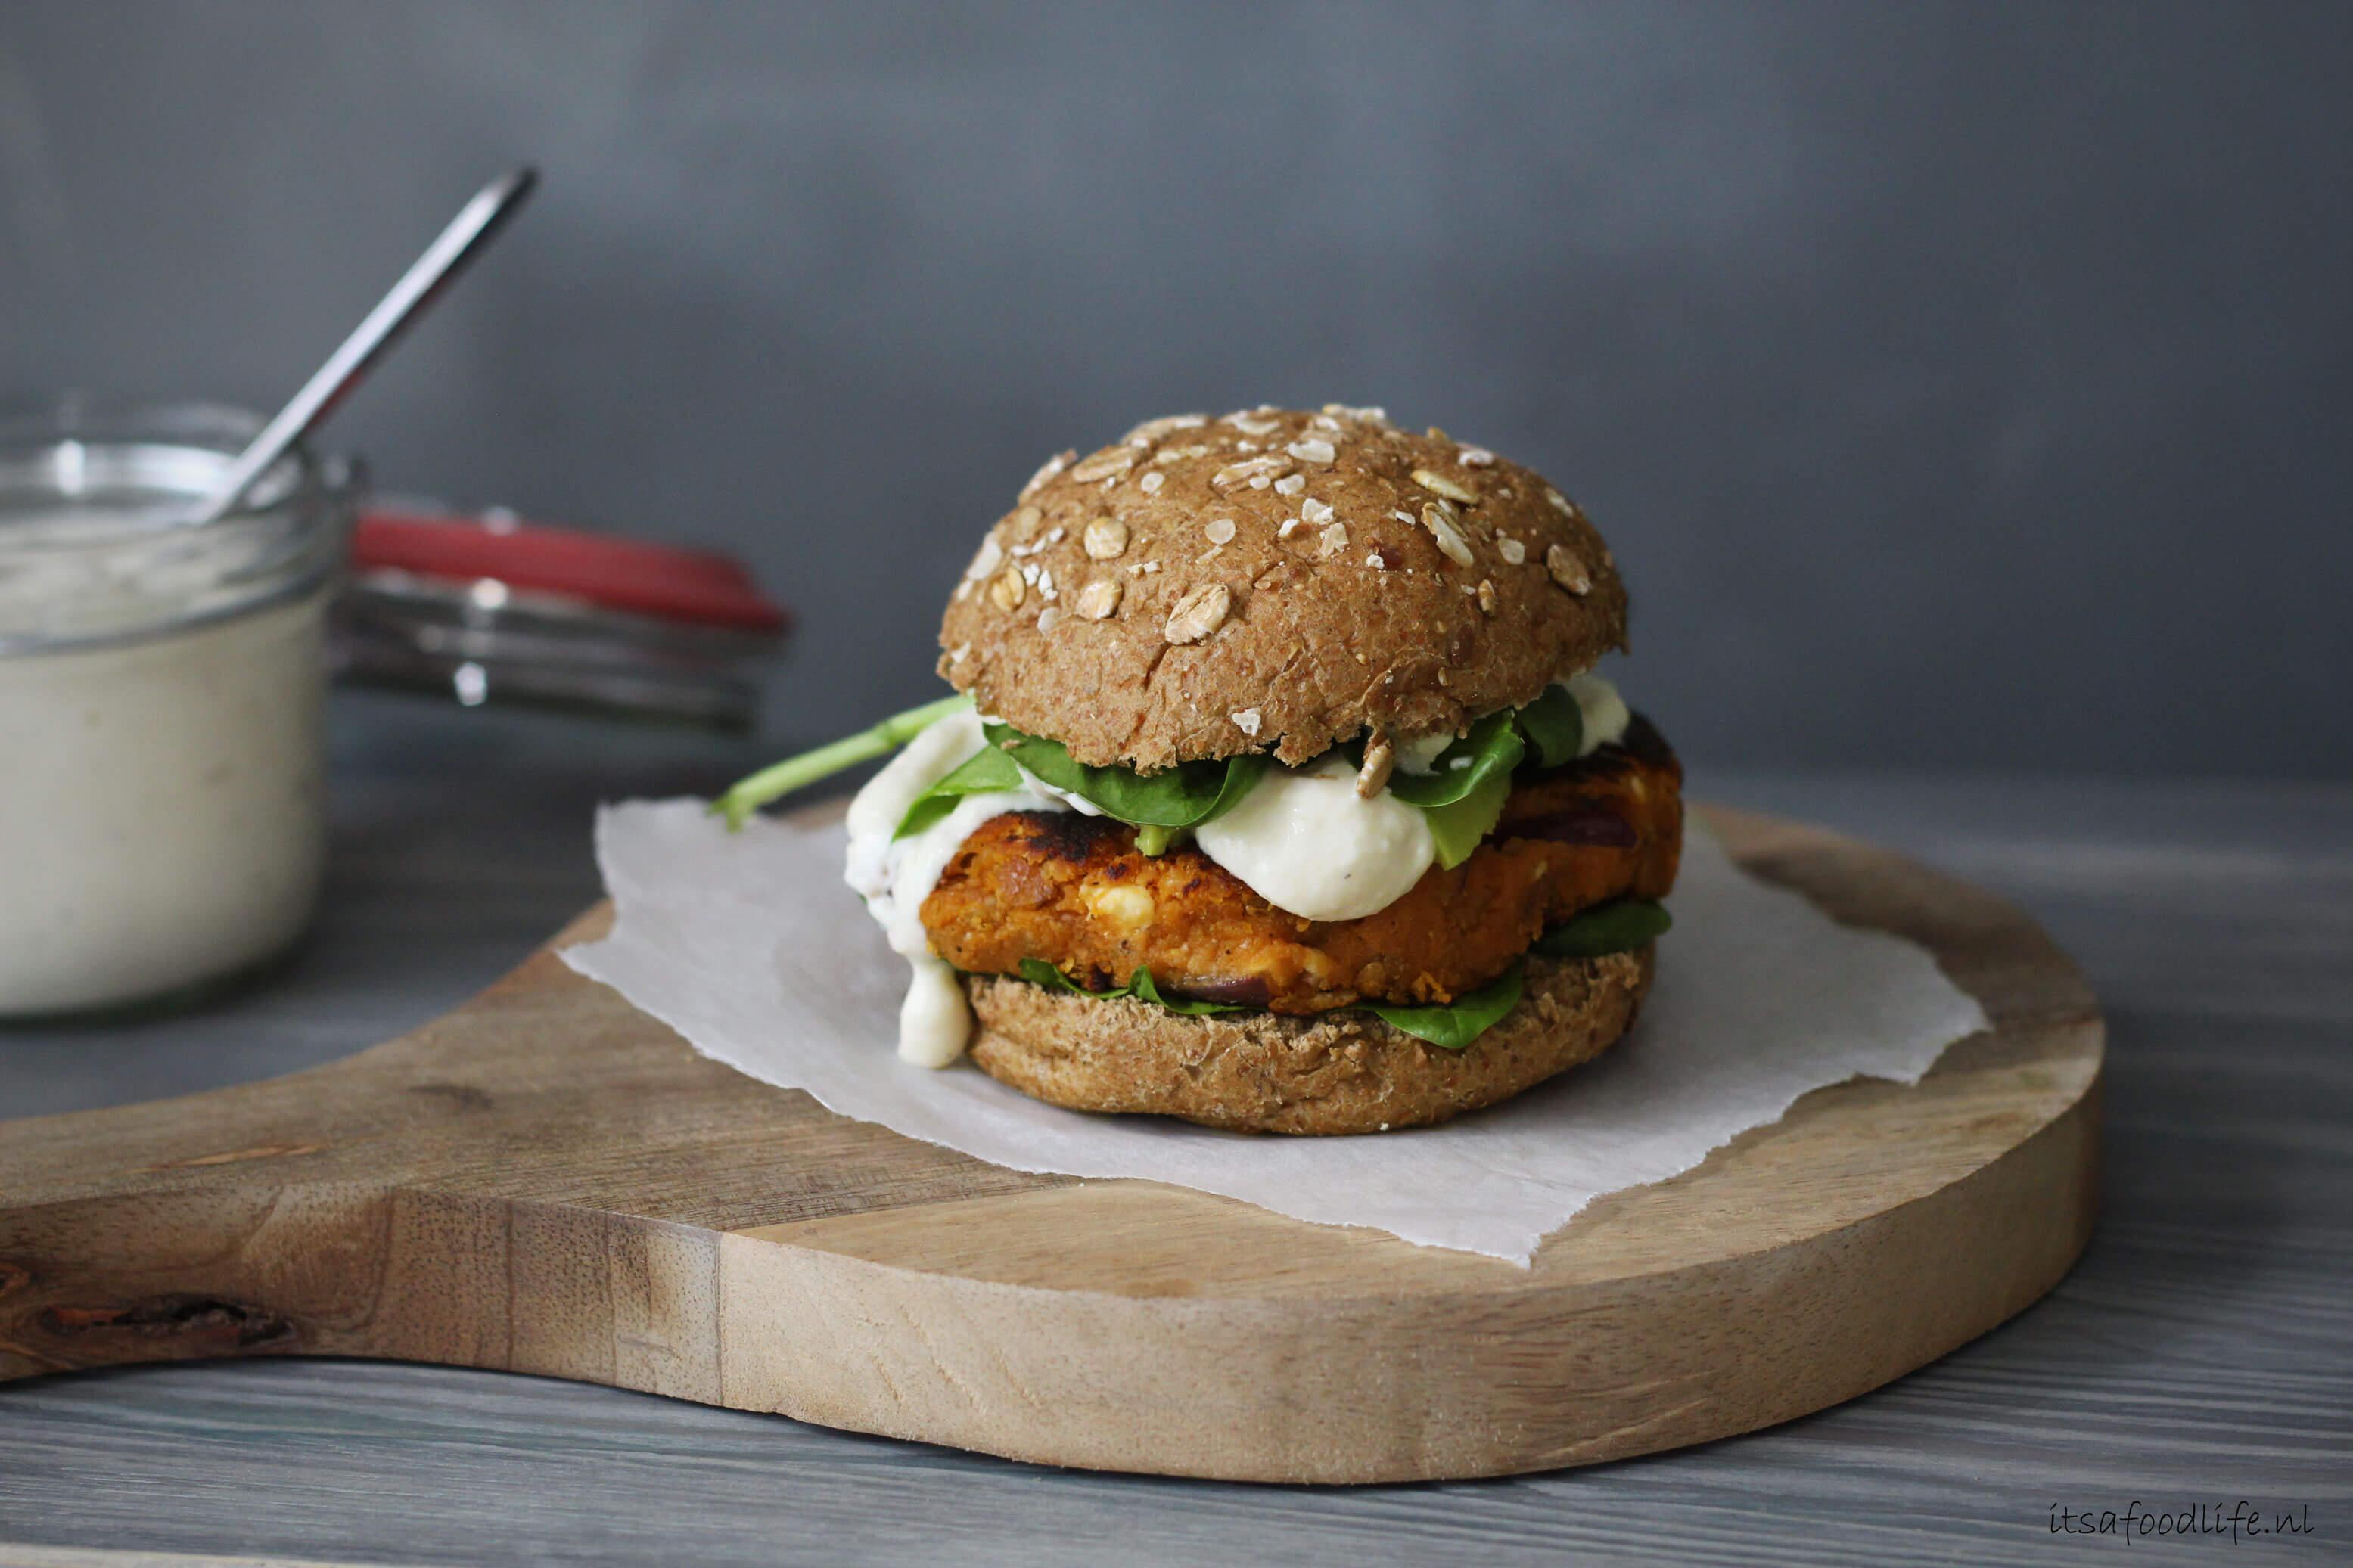 zoete aardappelburger | It's a Food life